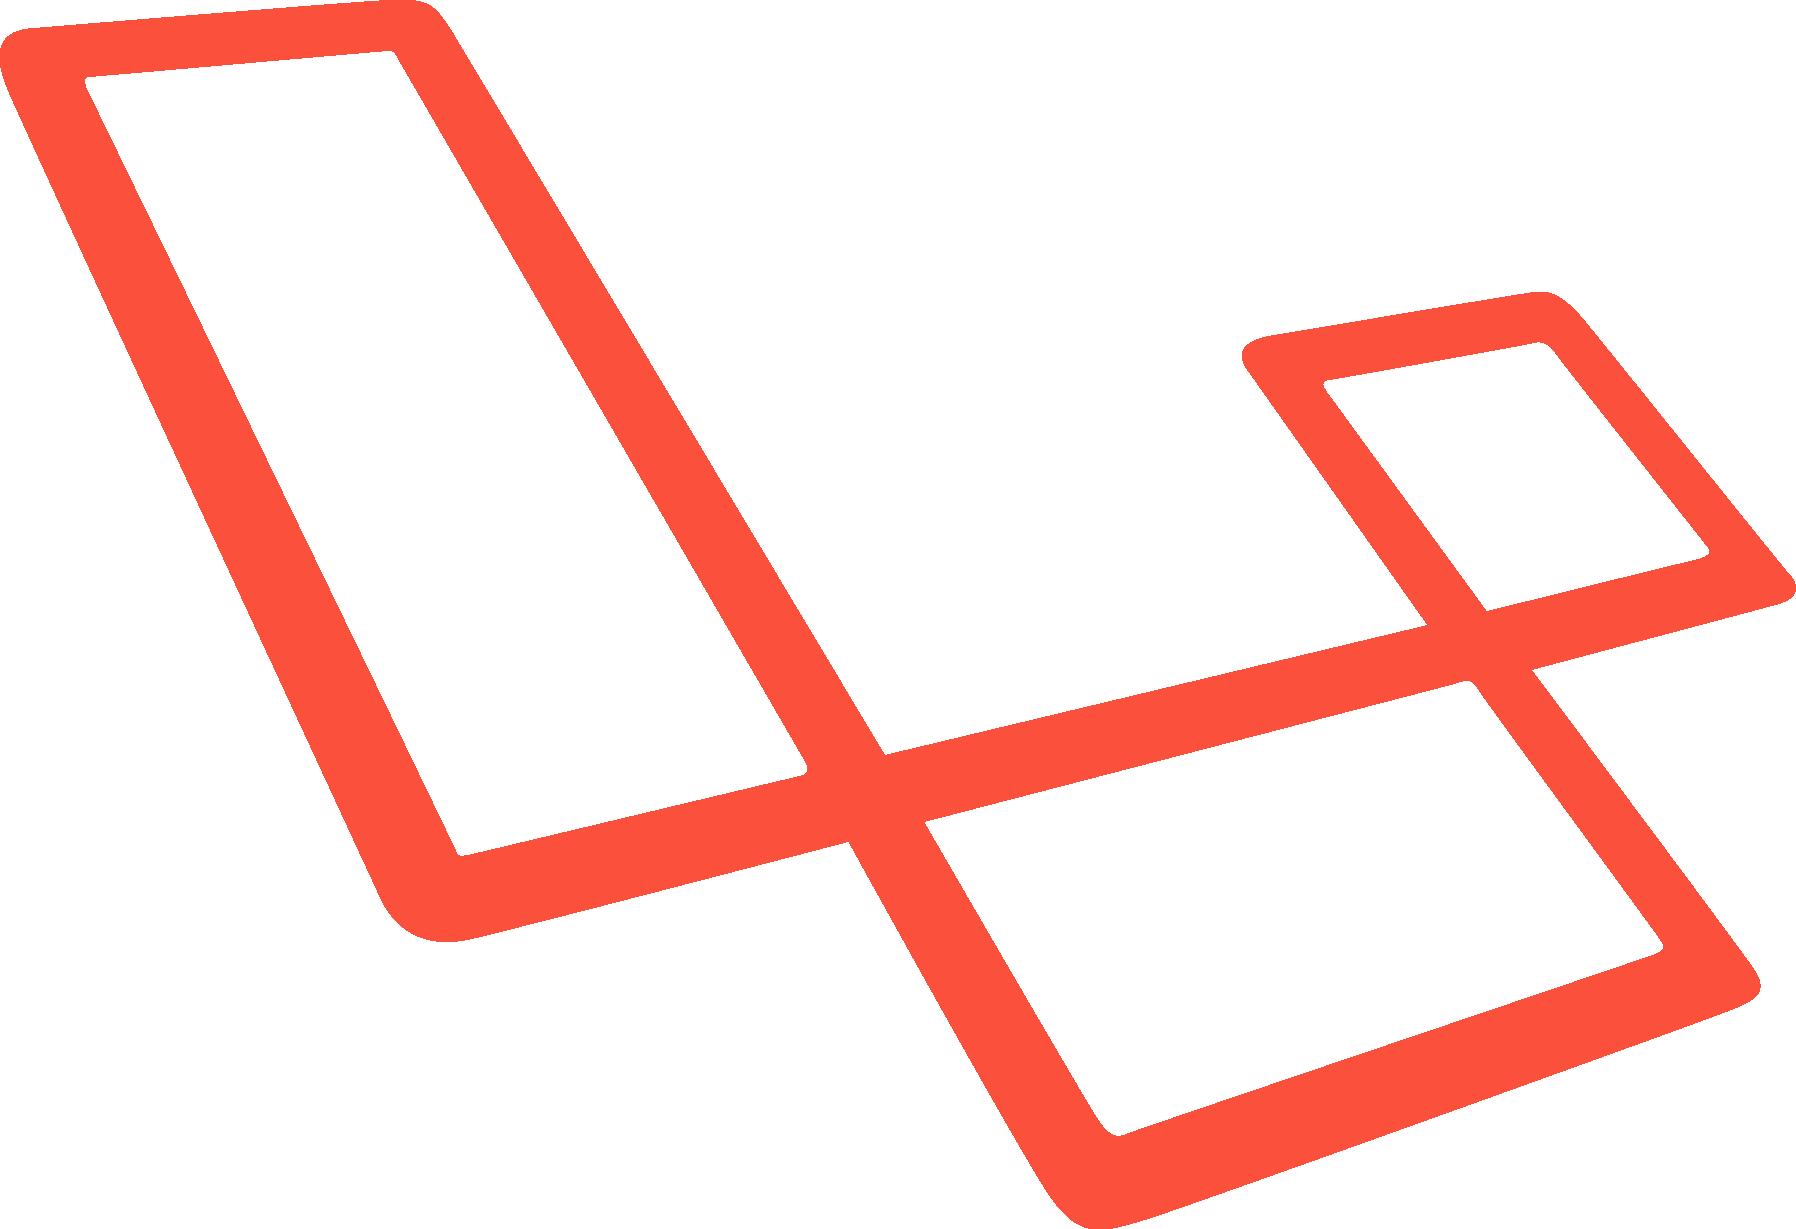 Laravel / Lumen MVC framework